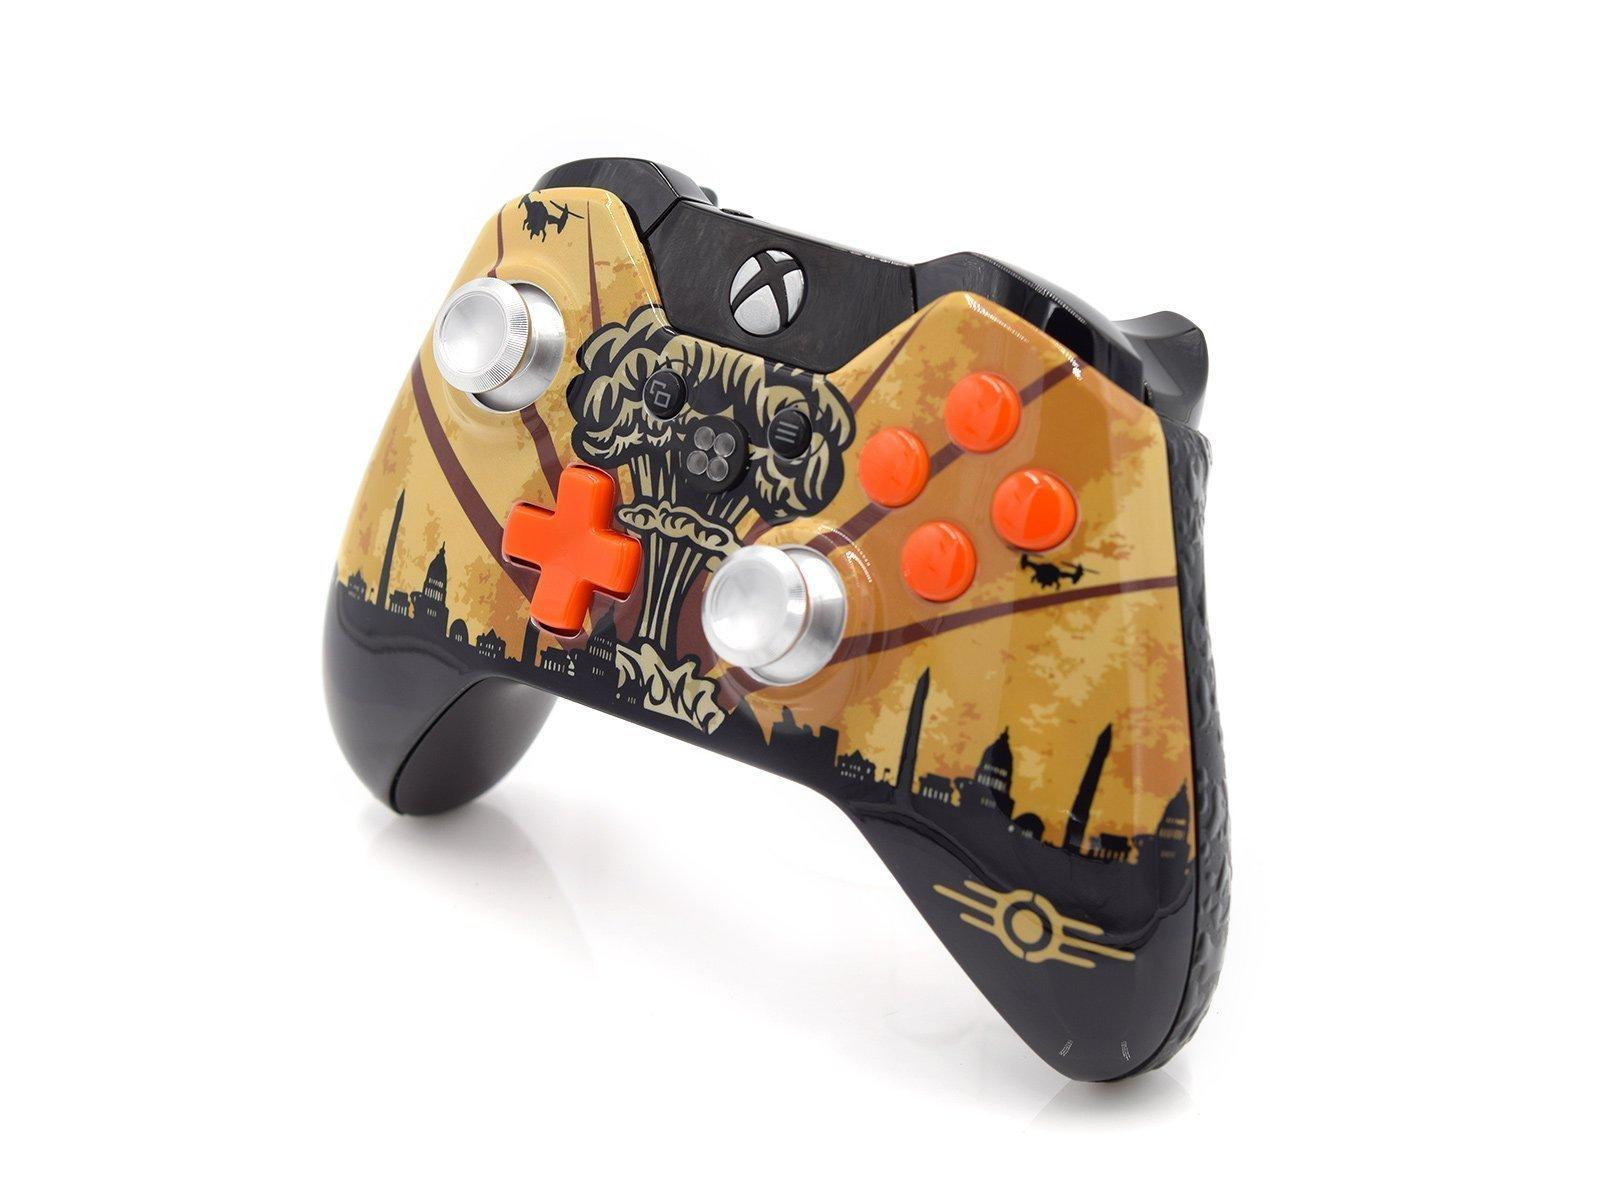 Nuketown Xbox One Custom Controller